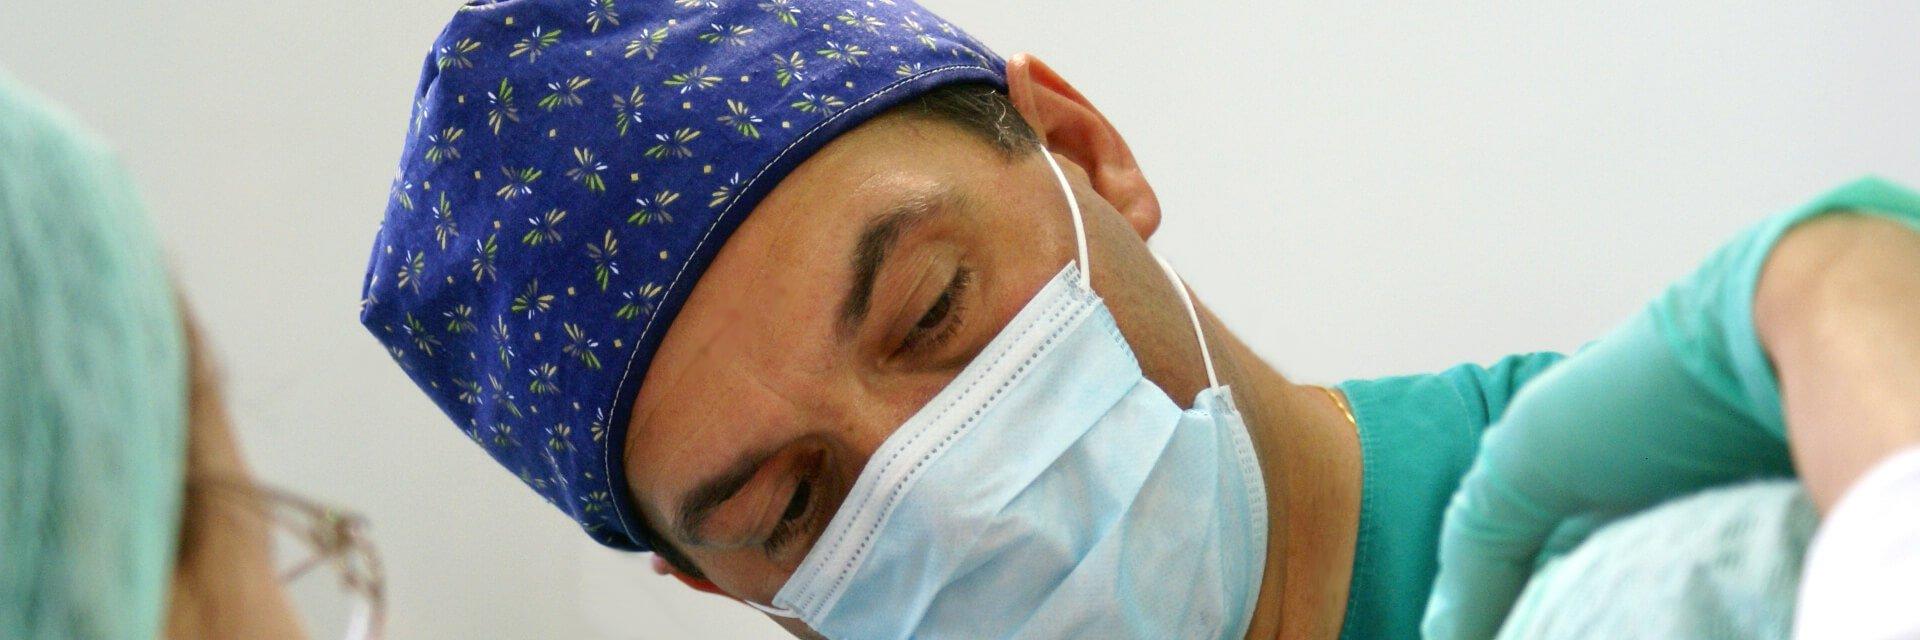 dubrovnik dental clinic